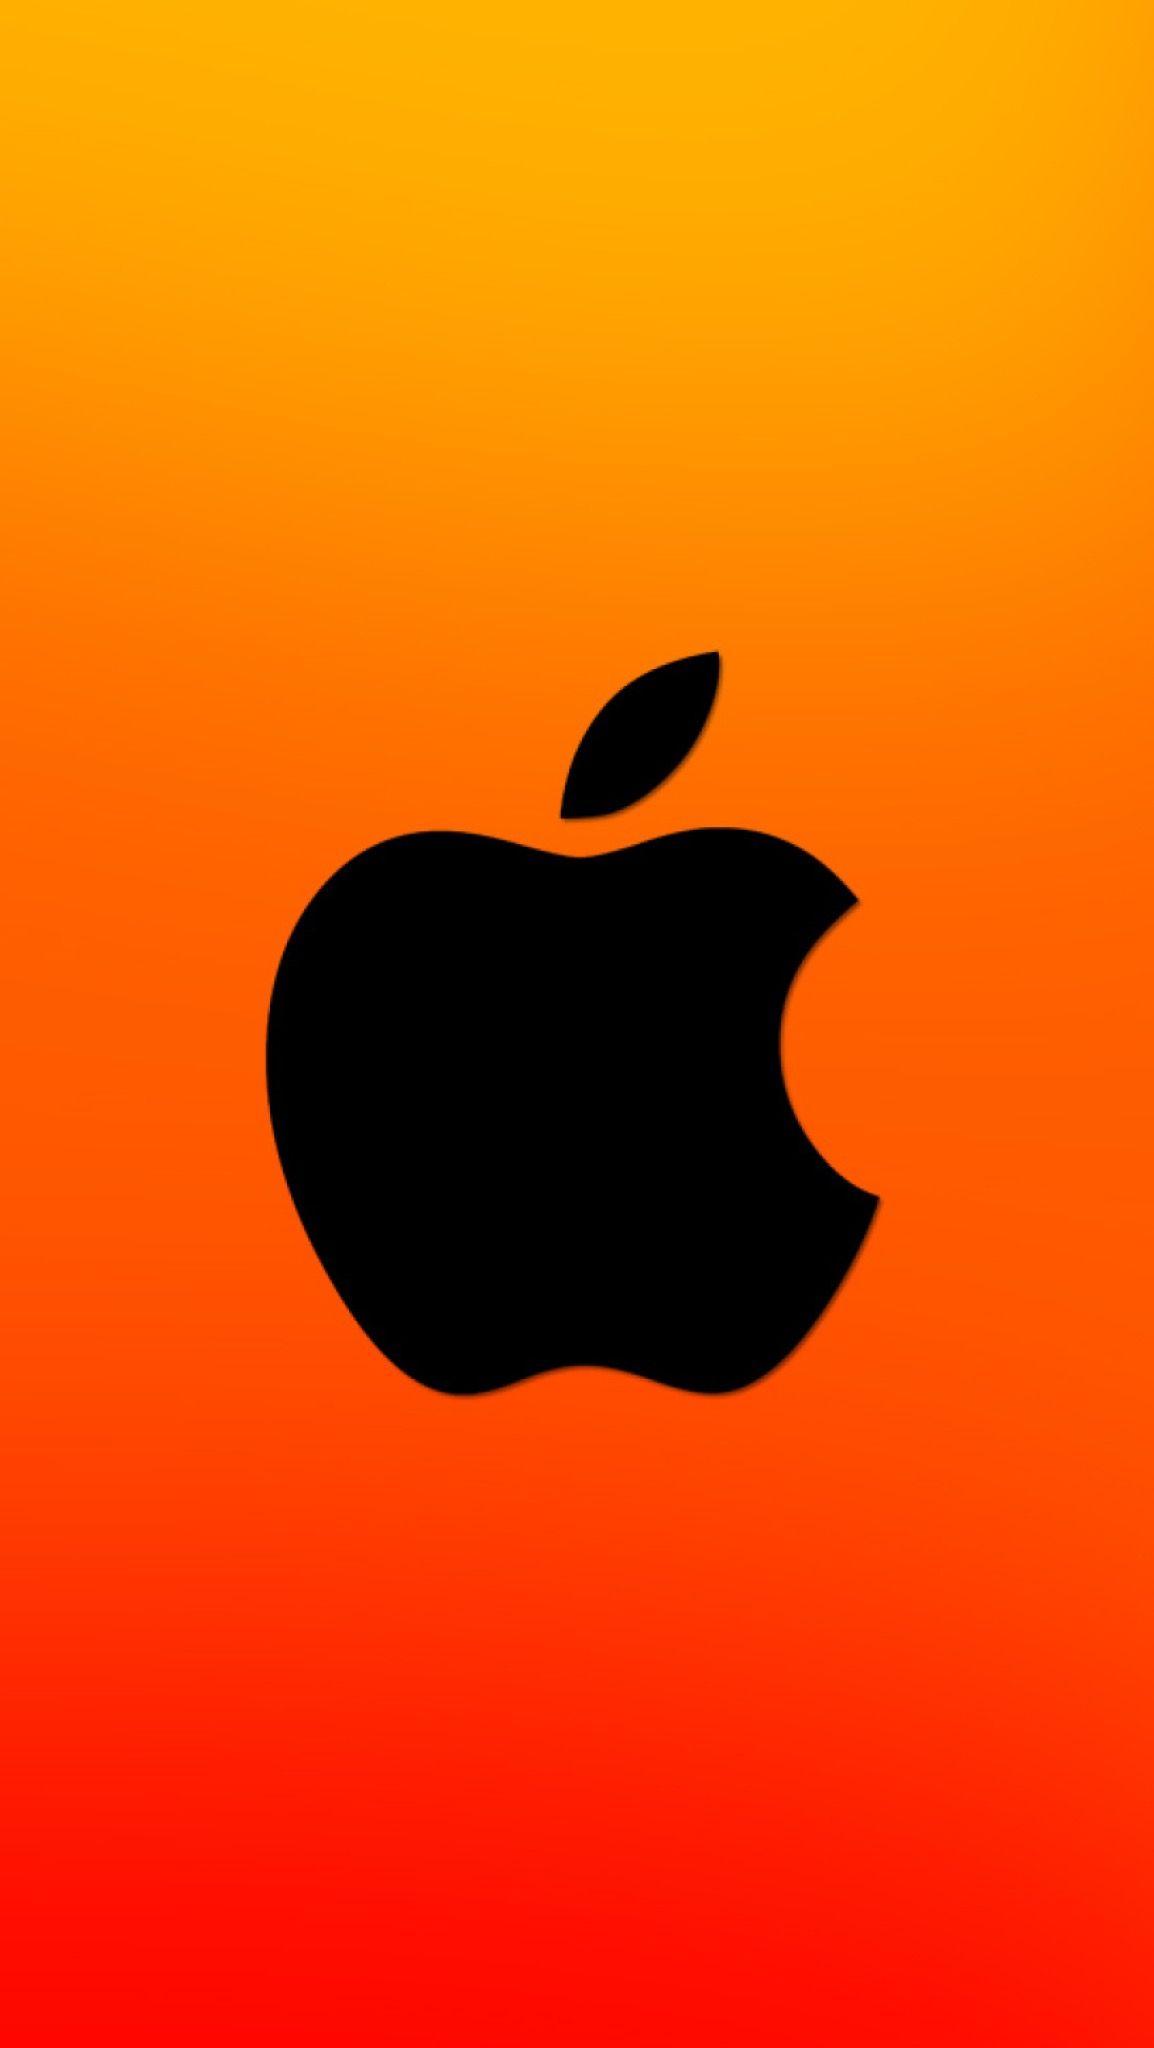 Wallpaper iPhone X Apple logo rainbow 4 Apple logo